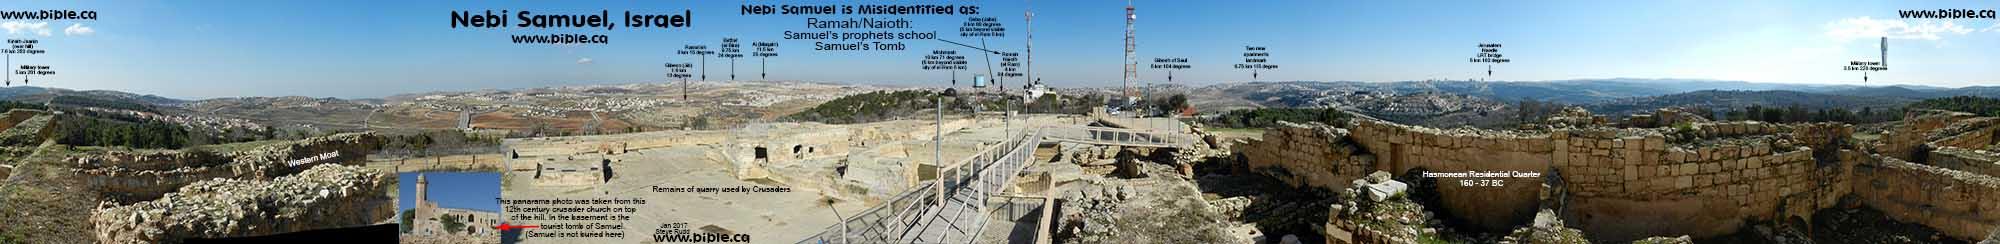 https://www.bible.ca/archeology/panorama-israel-archeology-ramah-naioth-nebi-samuels-tomb-prophets-school-gibeon-el-jib-th.jpg